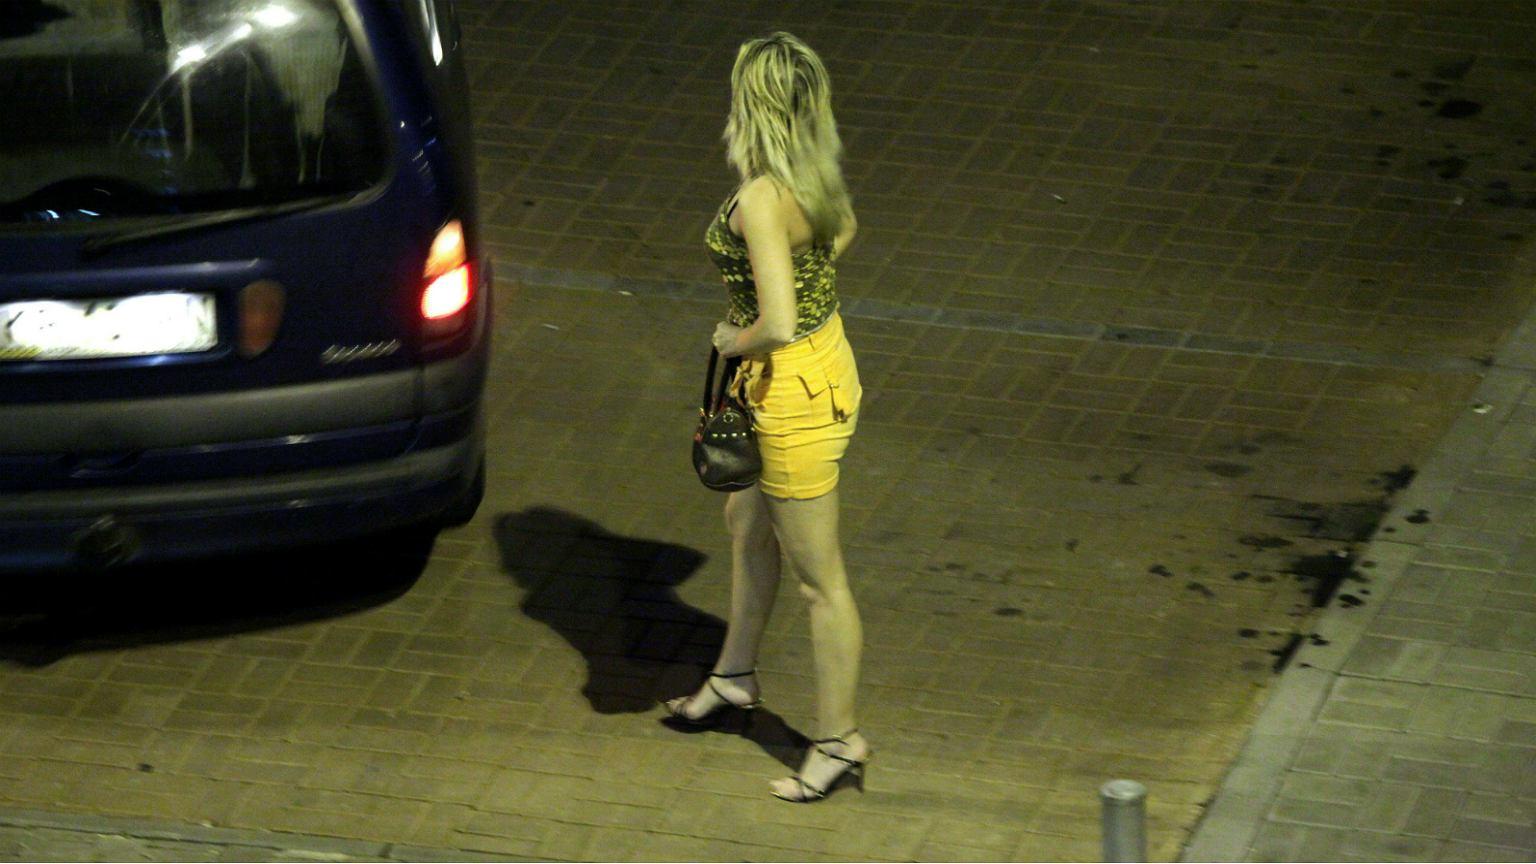 Katowice, 2009. Prostytutki w pracy